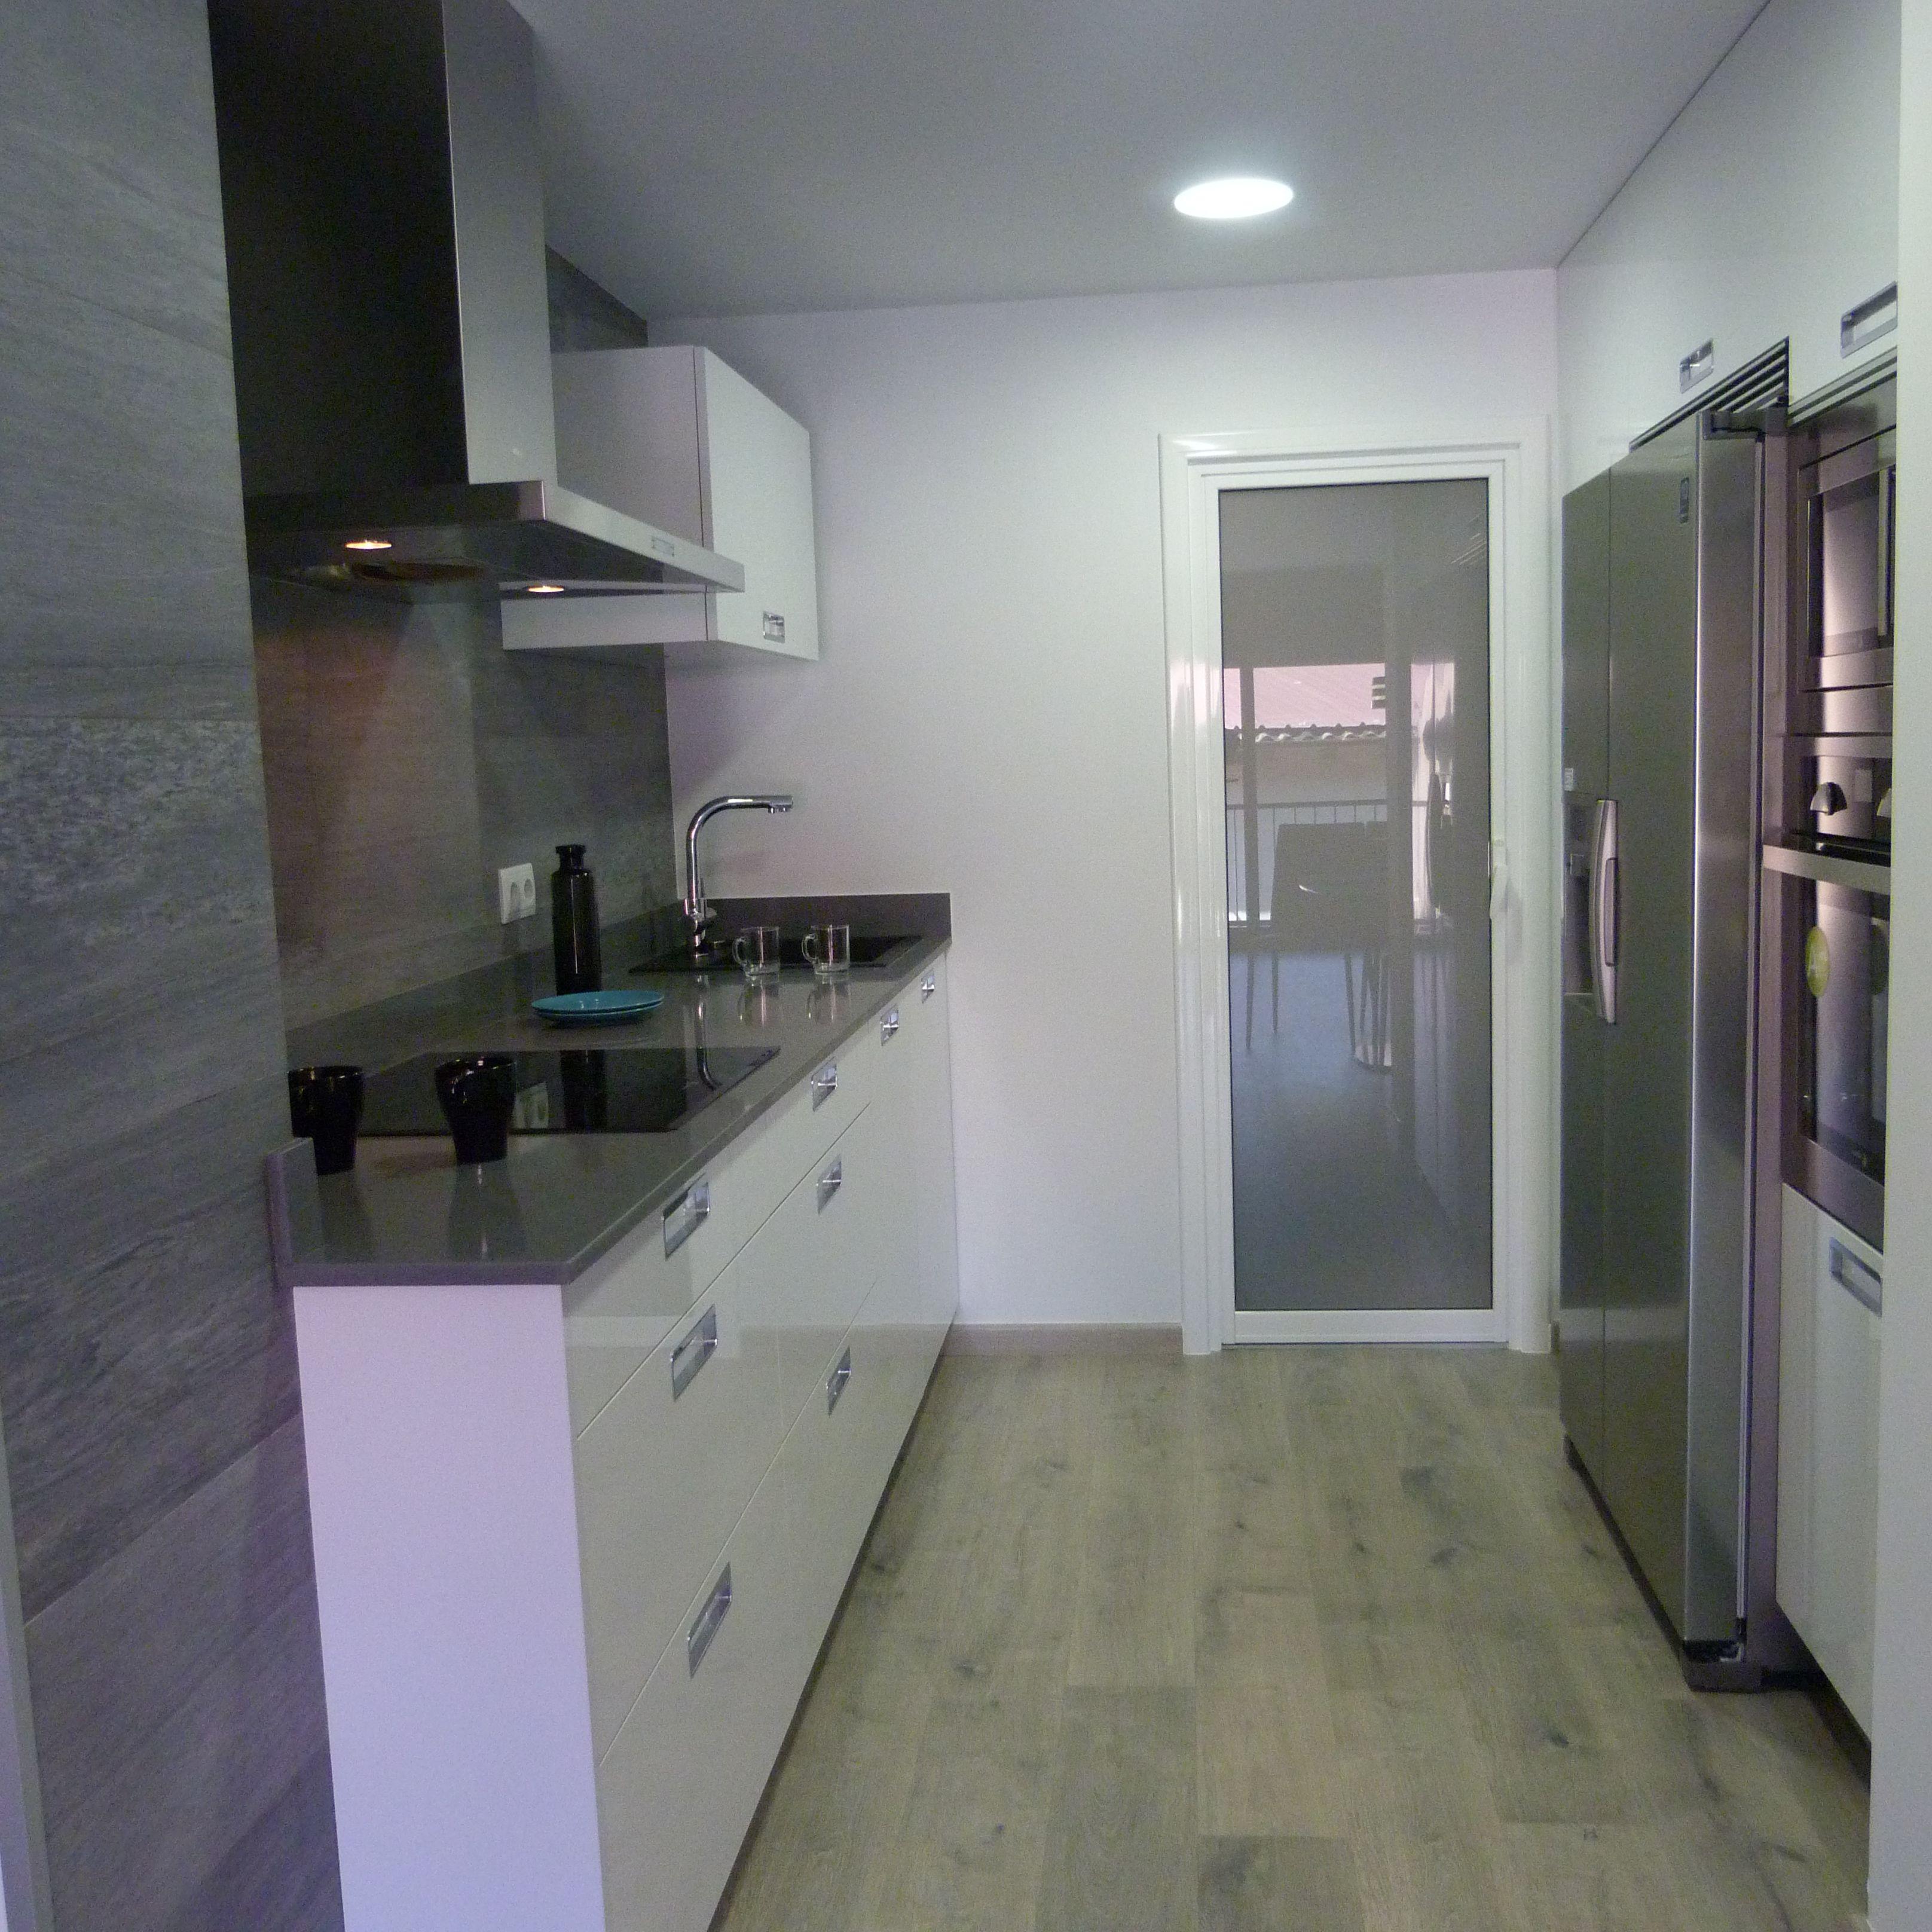 Mobiliario cocina santos modelo plano blanco brillo - Reforma cocina pequena ...